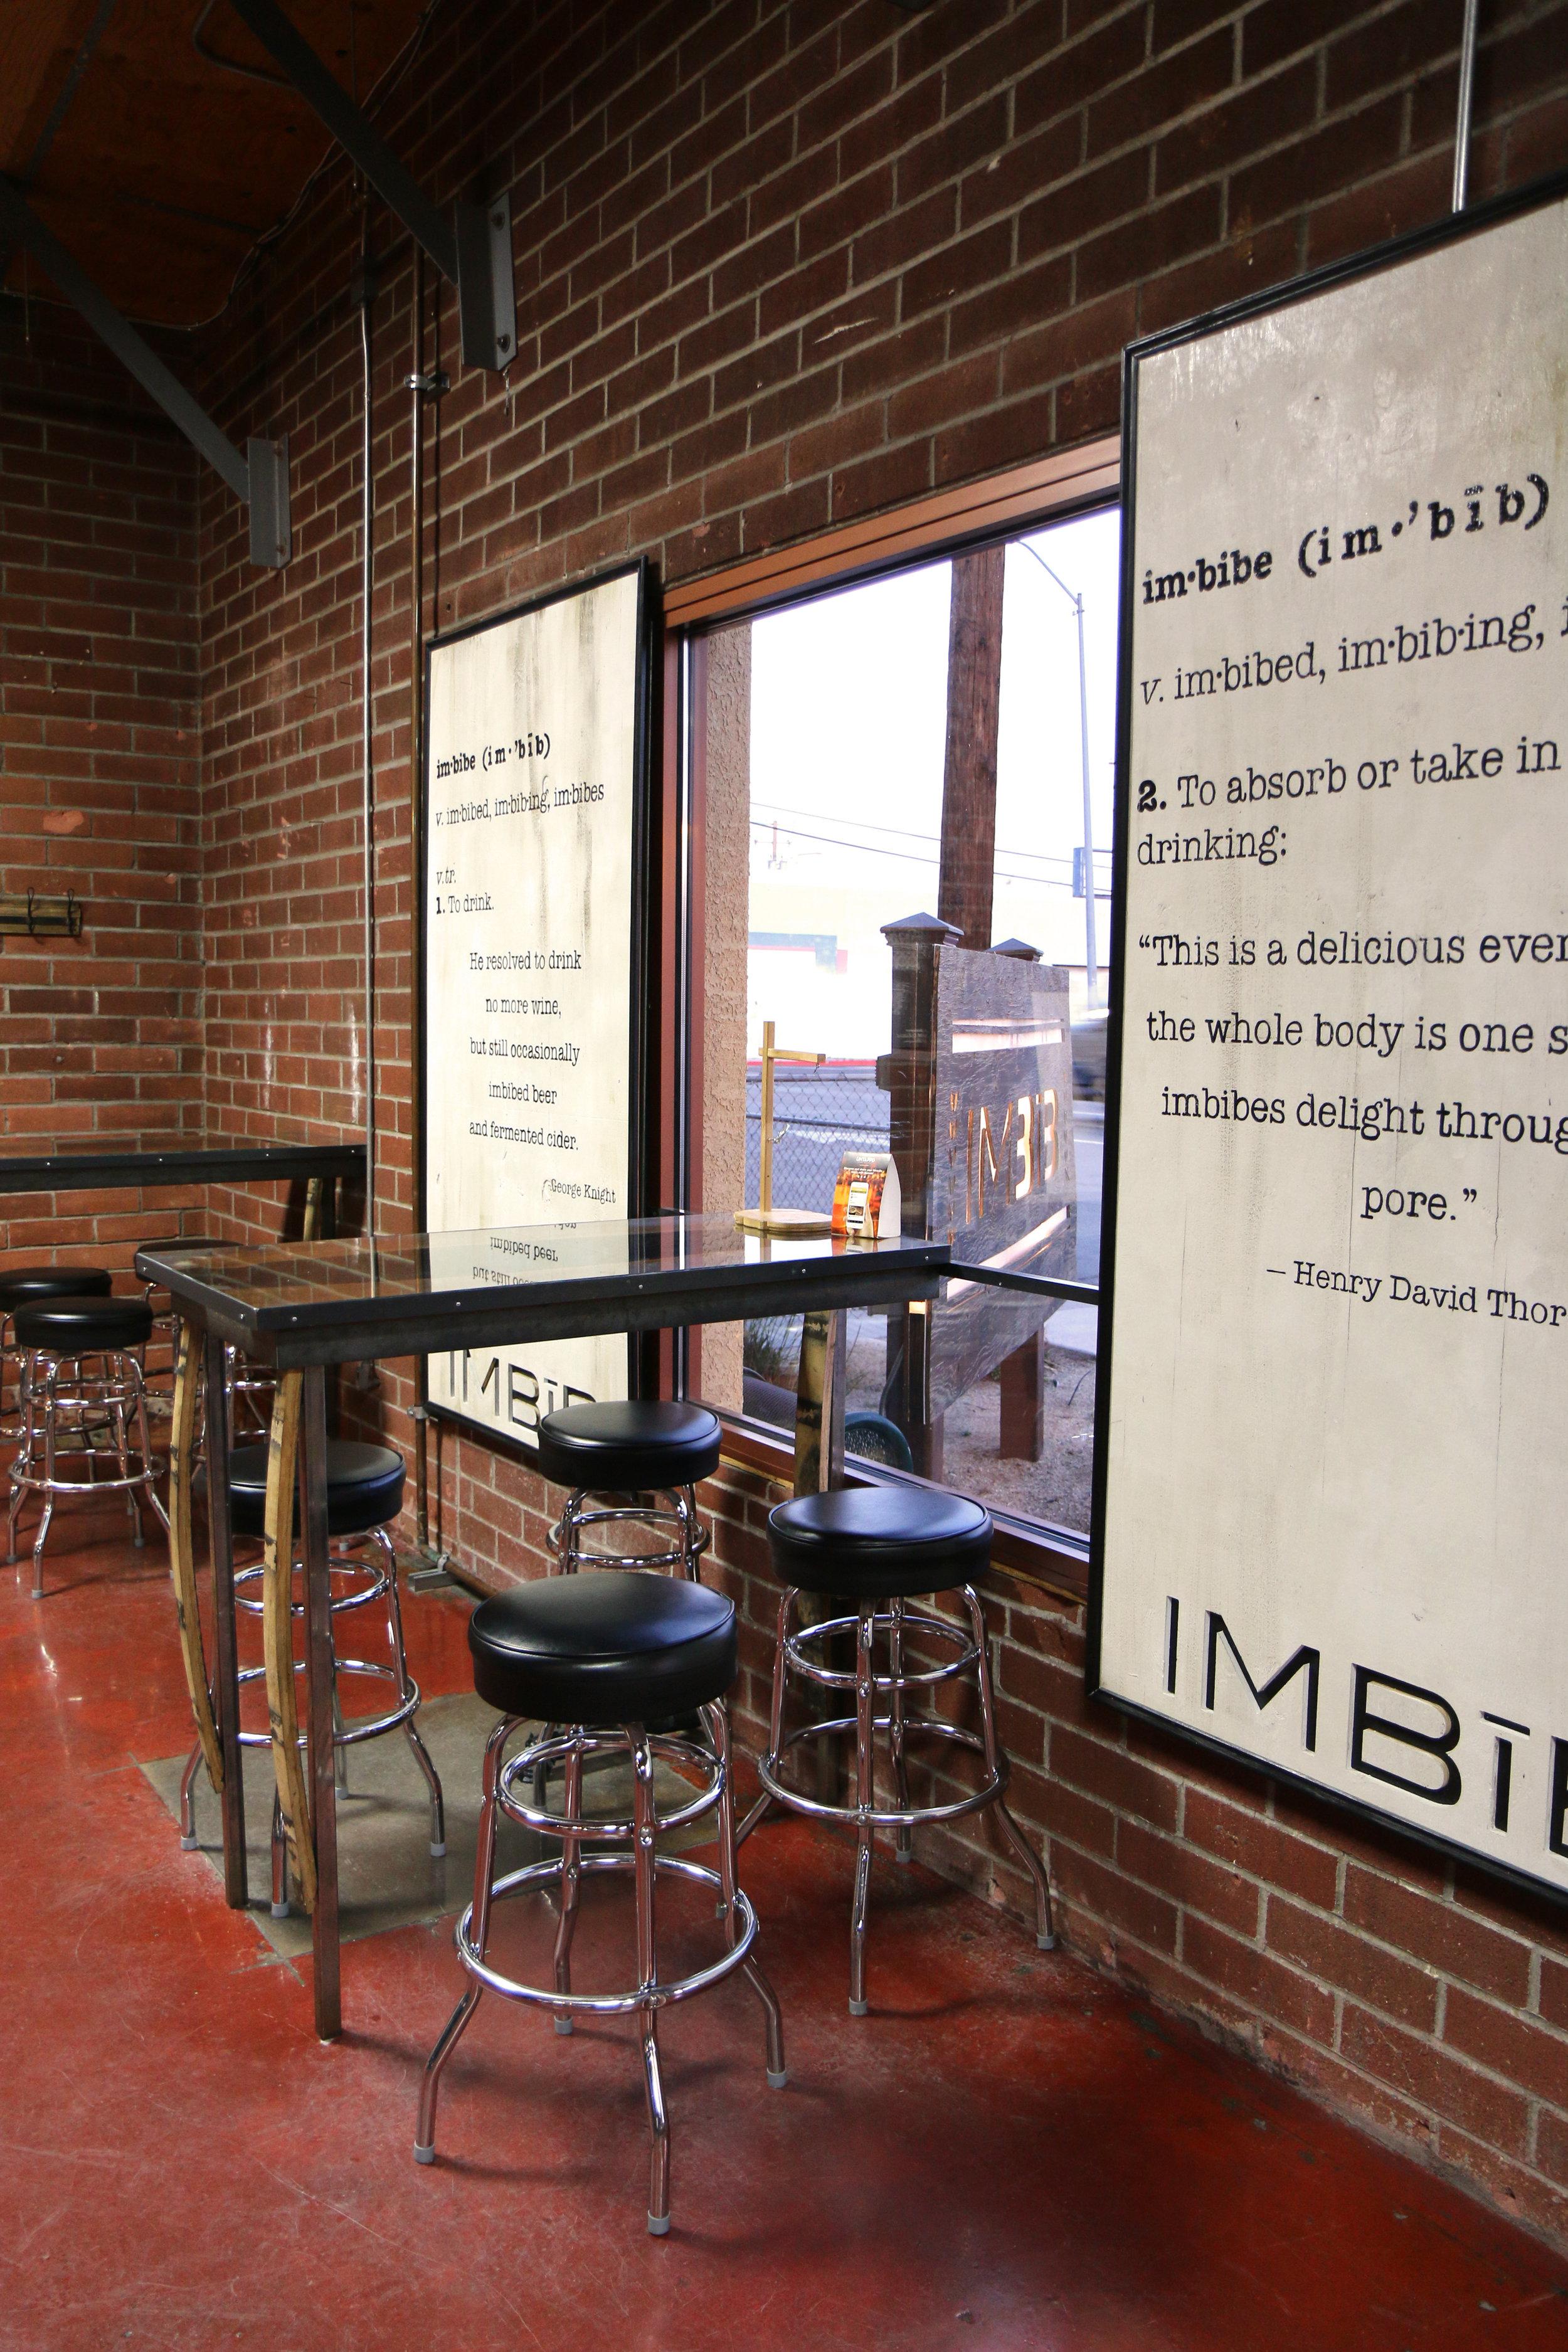 IMBĪB Custom Brews in Reno, Nevada